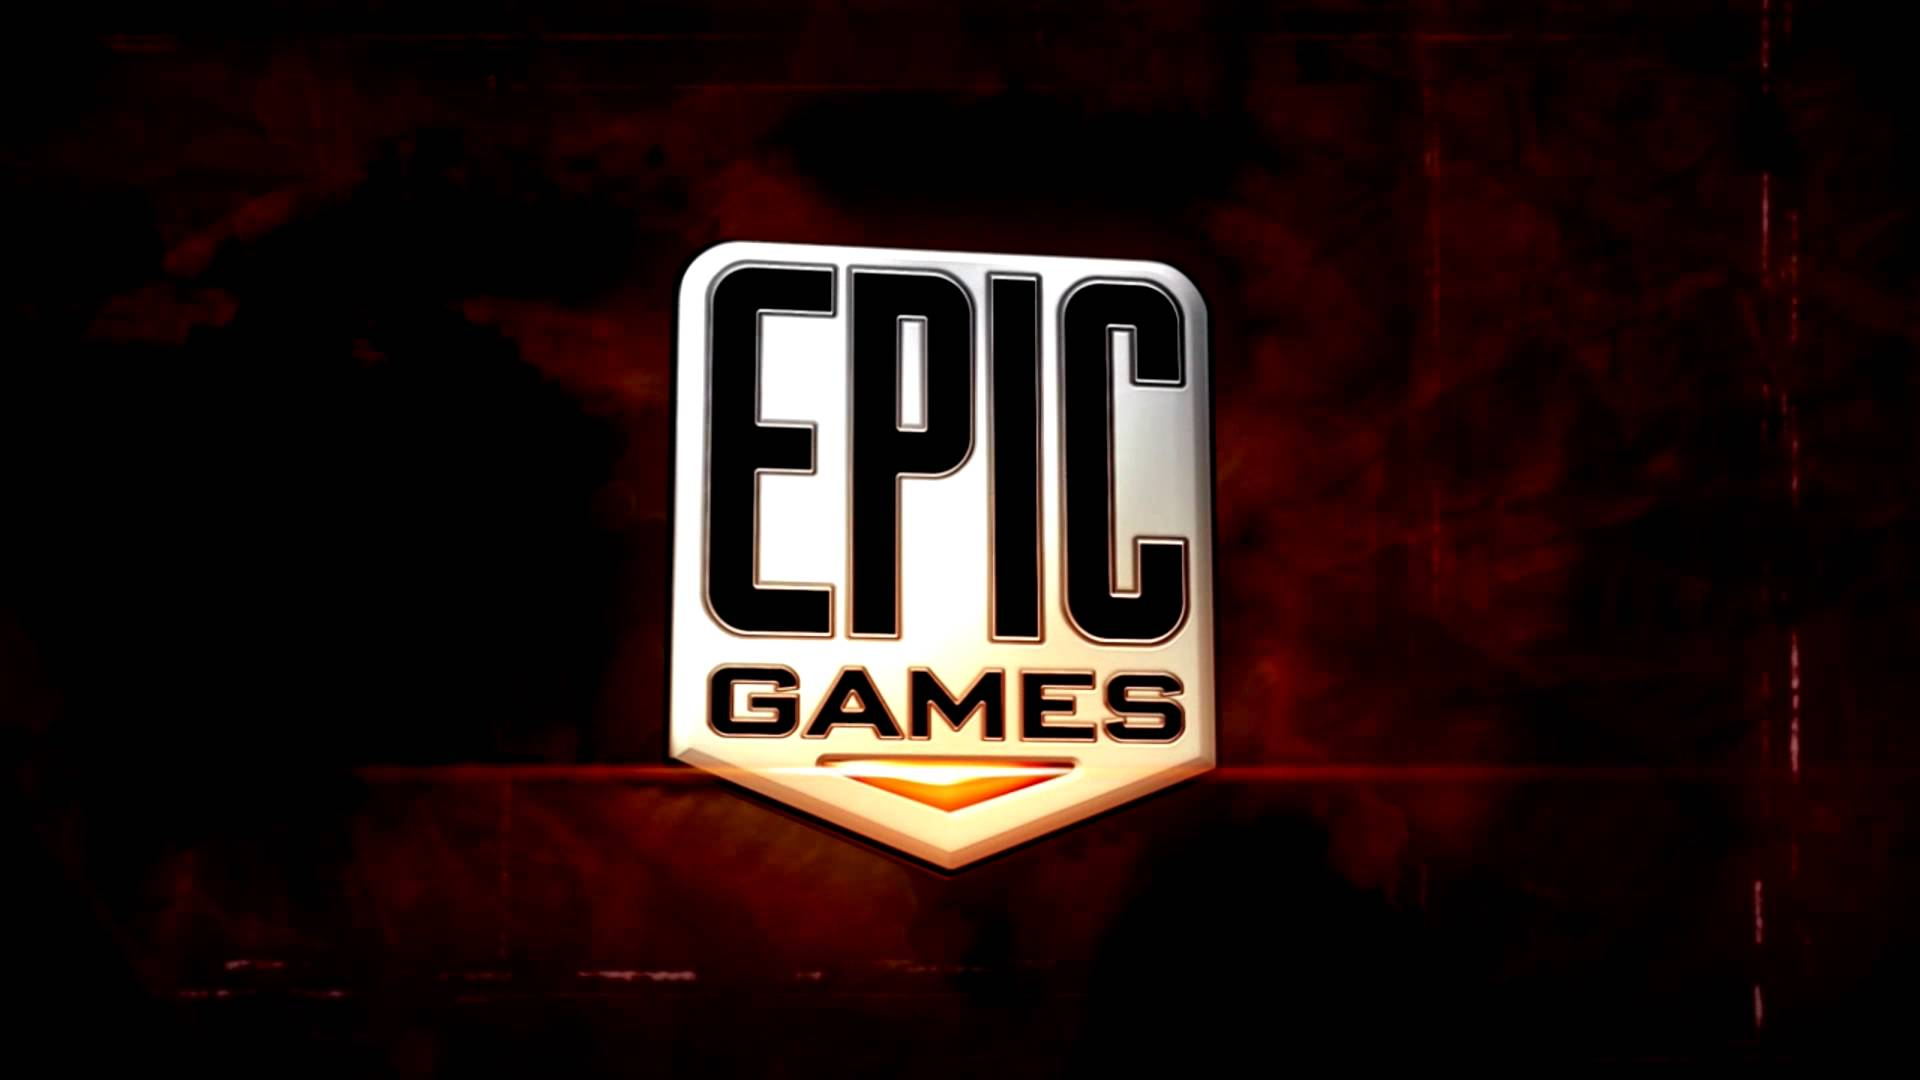 Epic Games - premio BAFTA